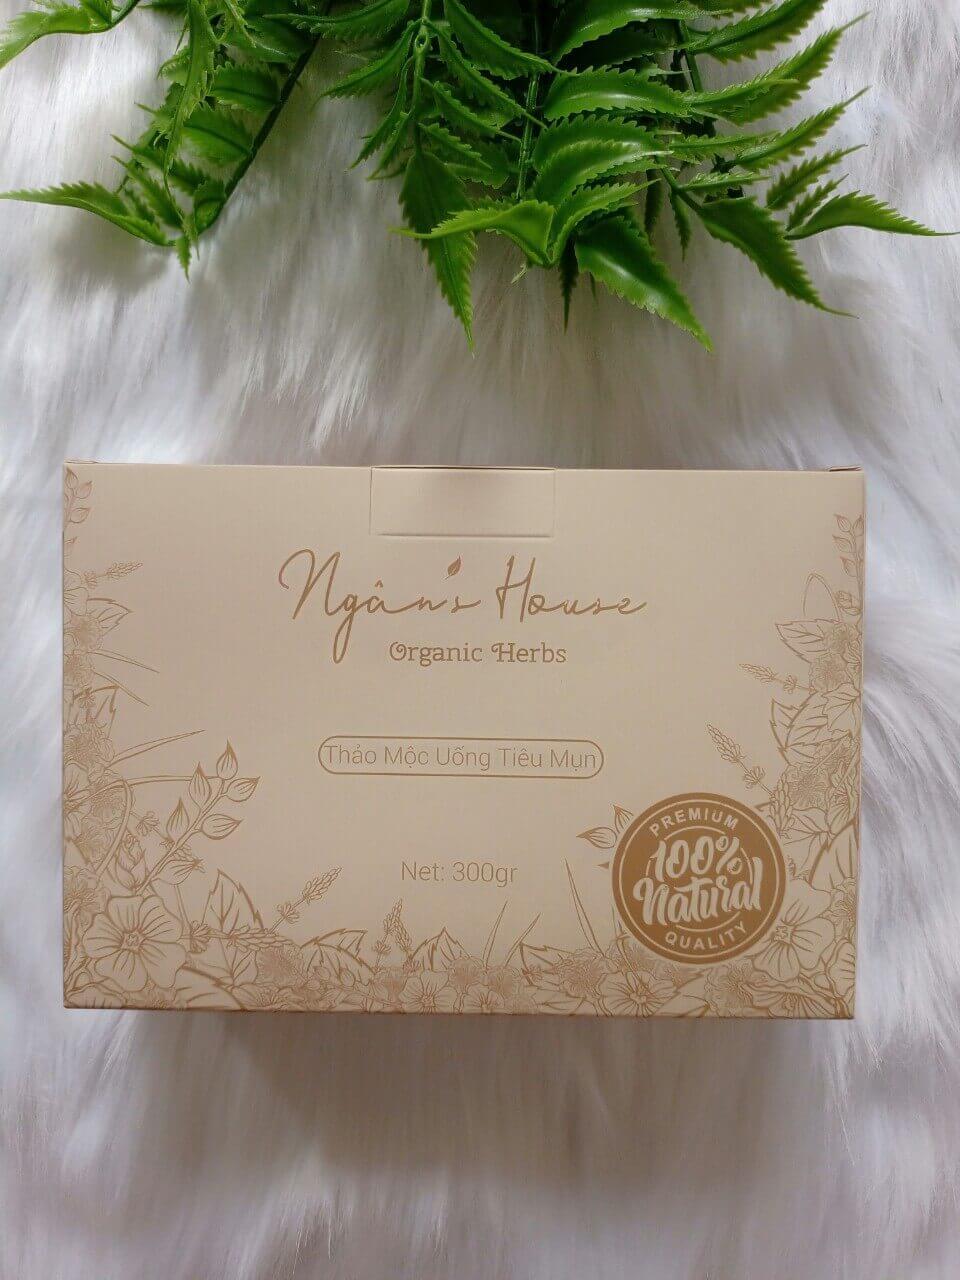 ngan-house-organic-herbs